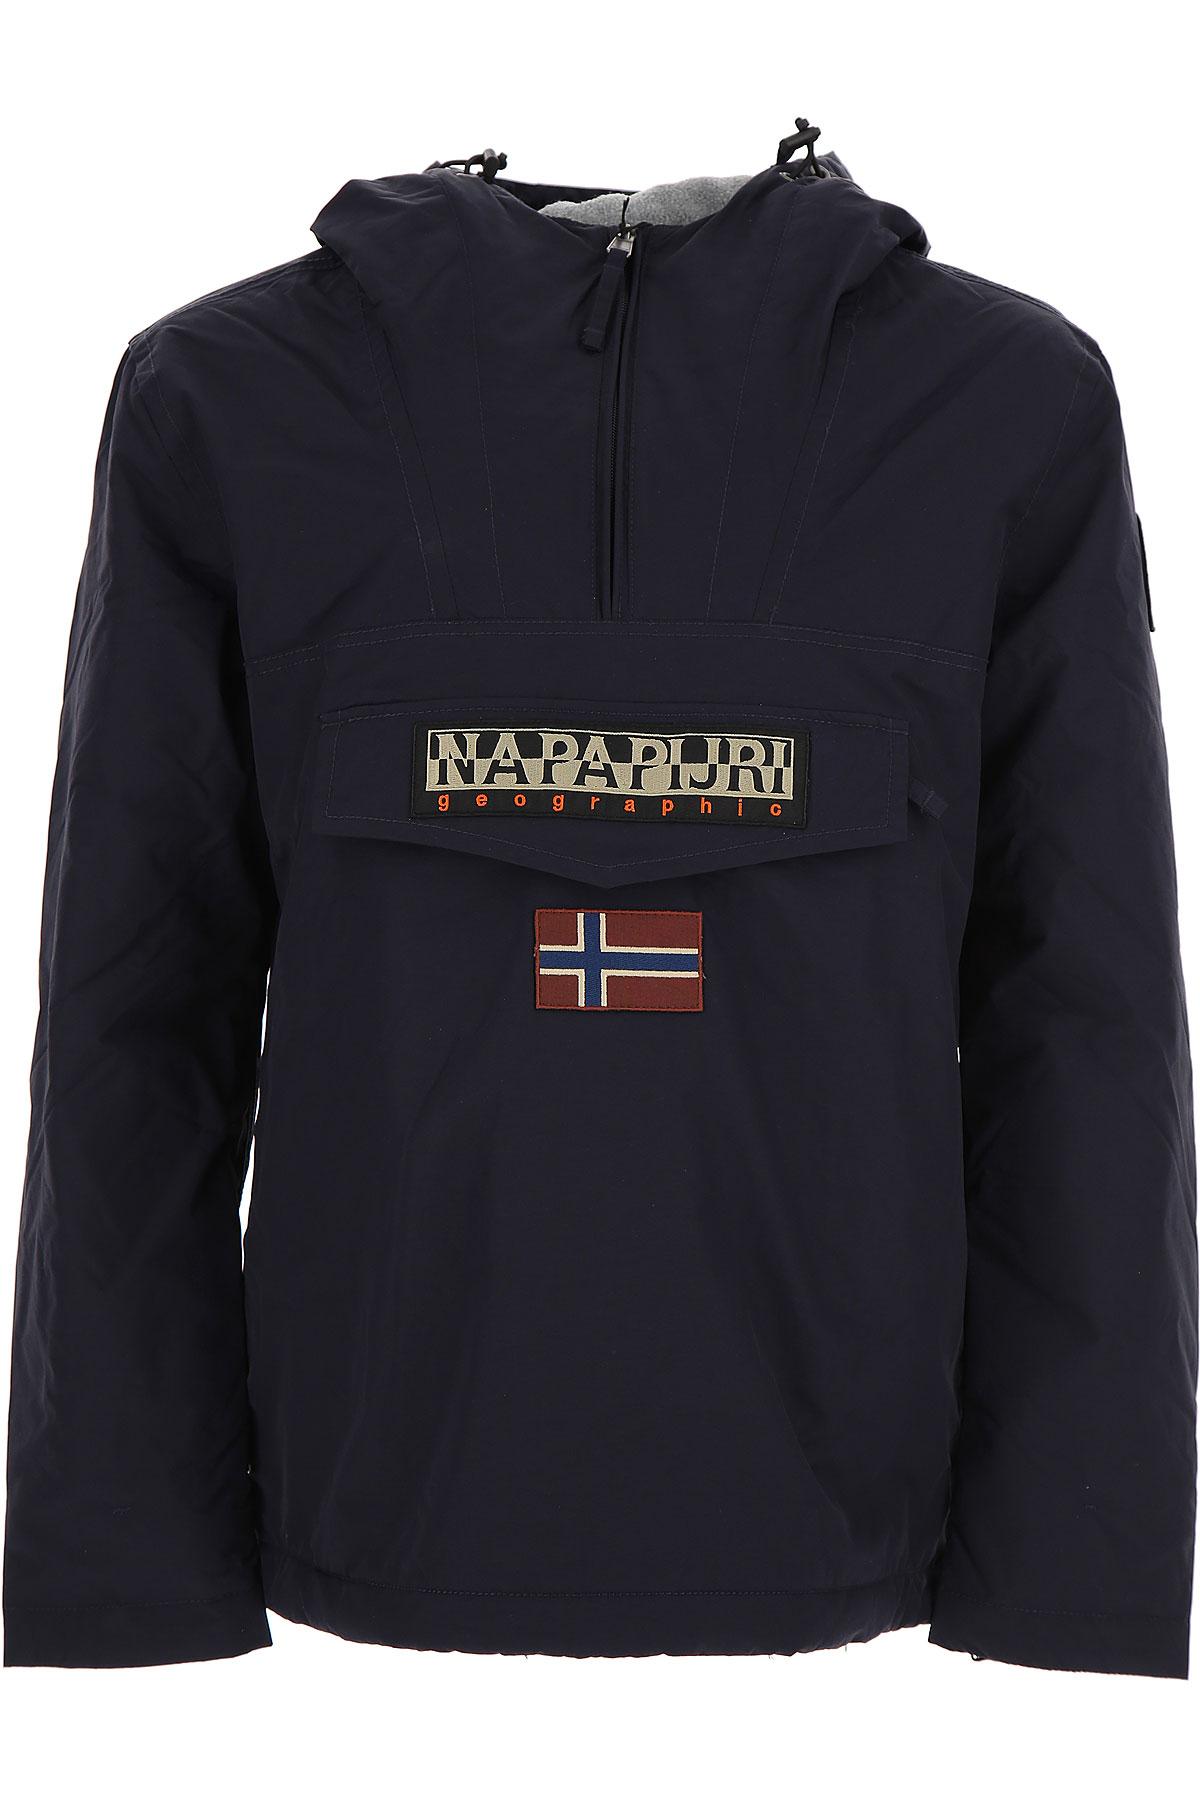 Image of Napapijri Down Jacket for Men, Puffer Ski Jacket, Blue Marine, poliestere, 2017, L M S XL XS XXL